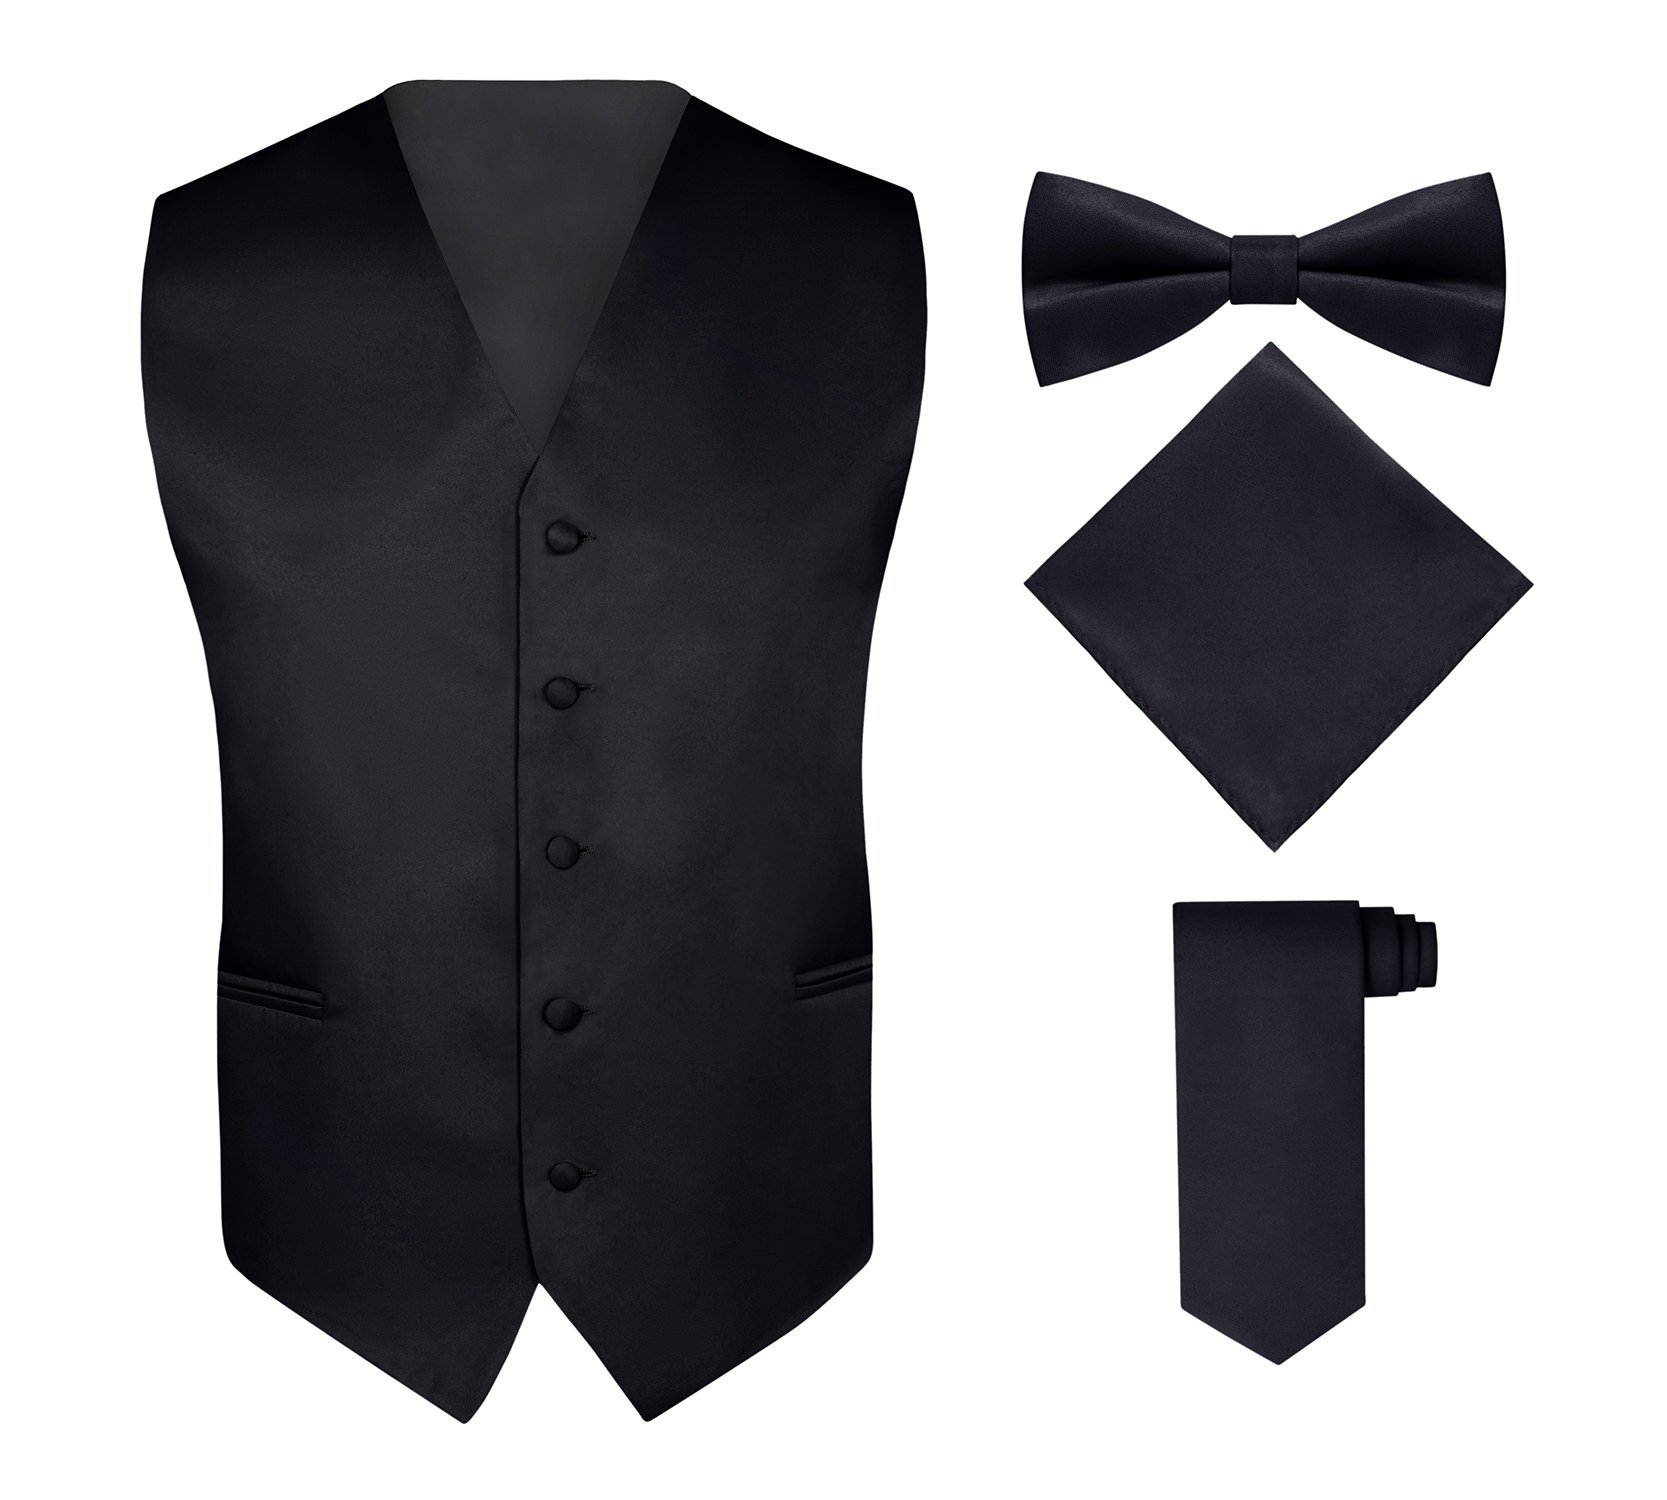 S.H. Churchill & Co. Men's 4 Piece Vest Set, with Bow Tie, Neck Tie & Pocket Hankie - Black, XL